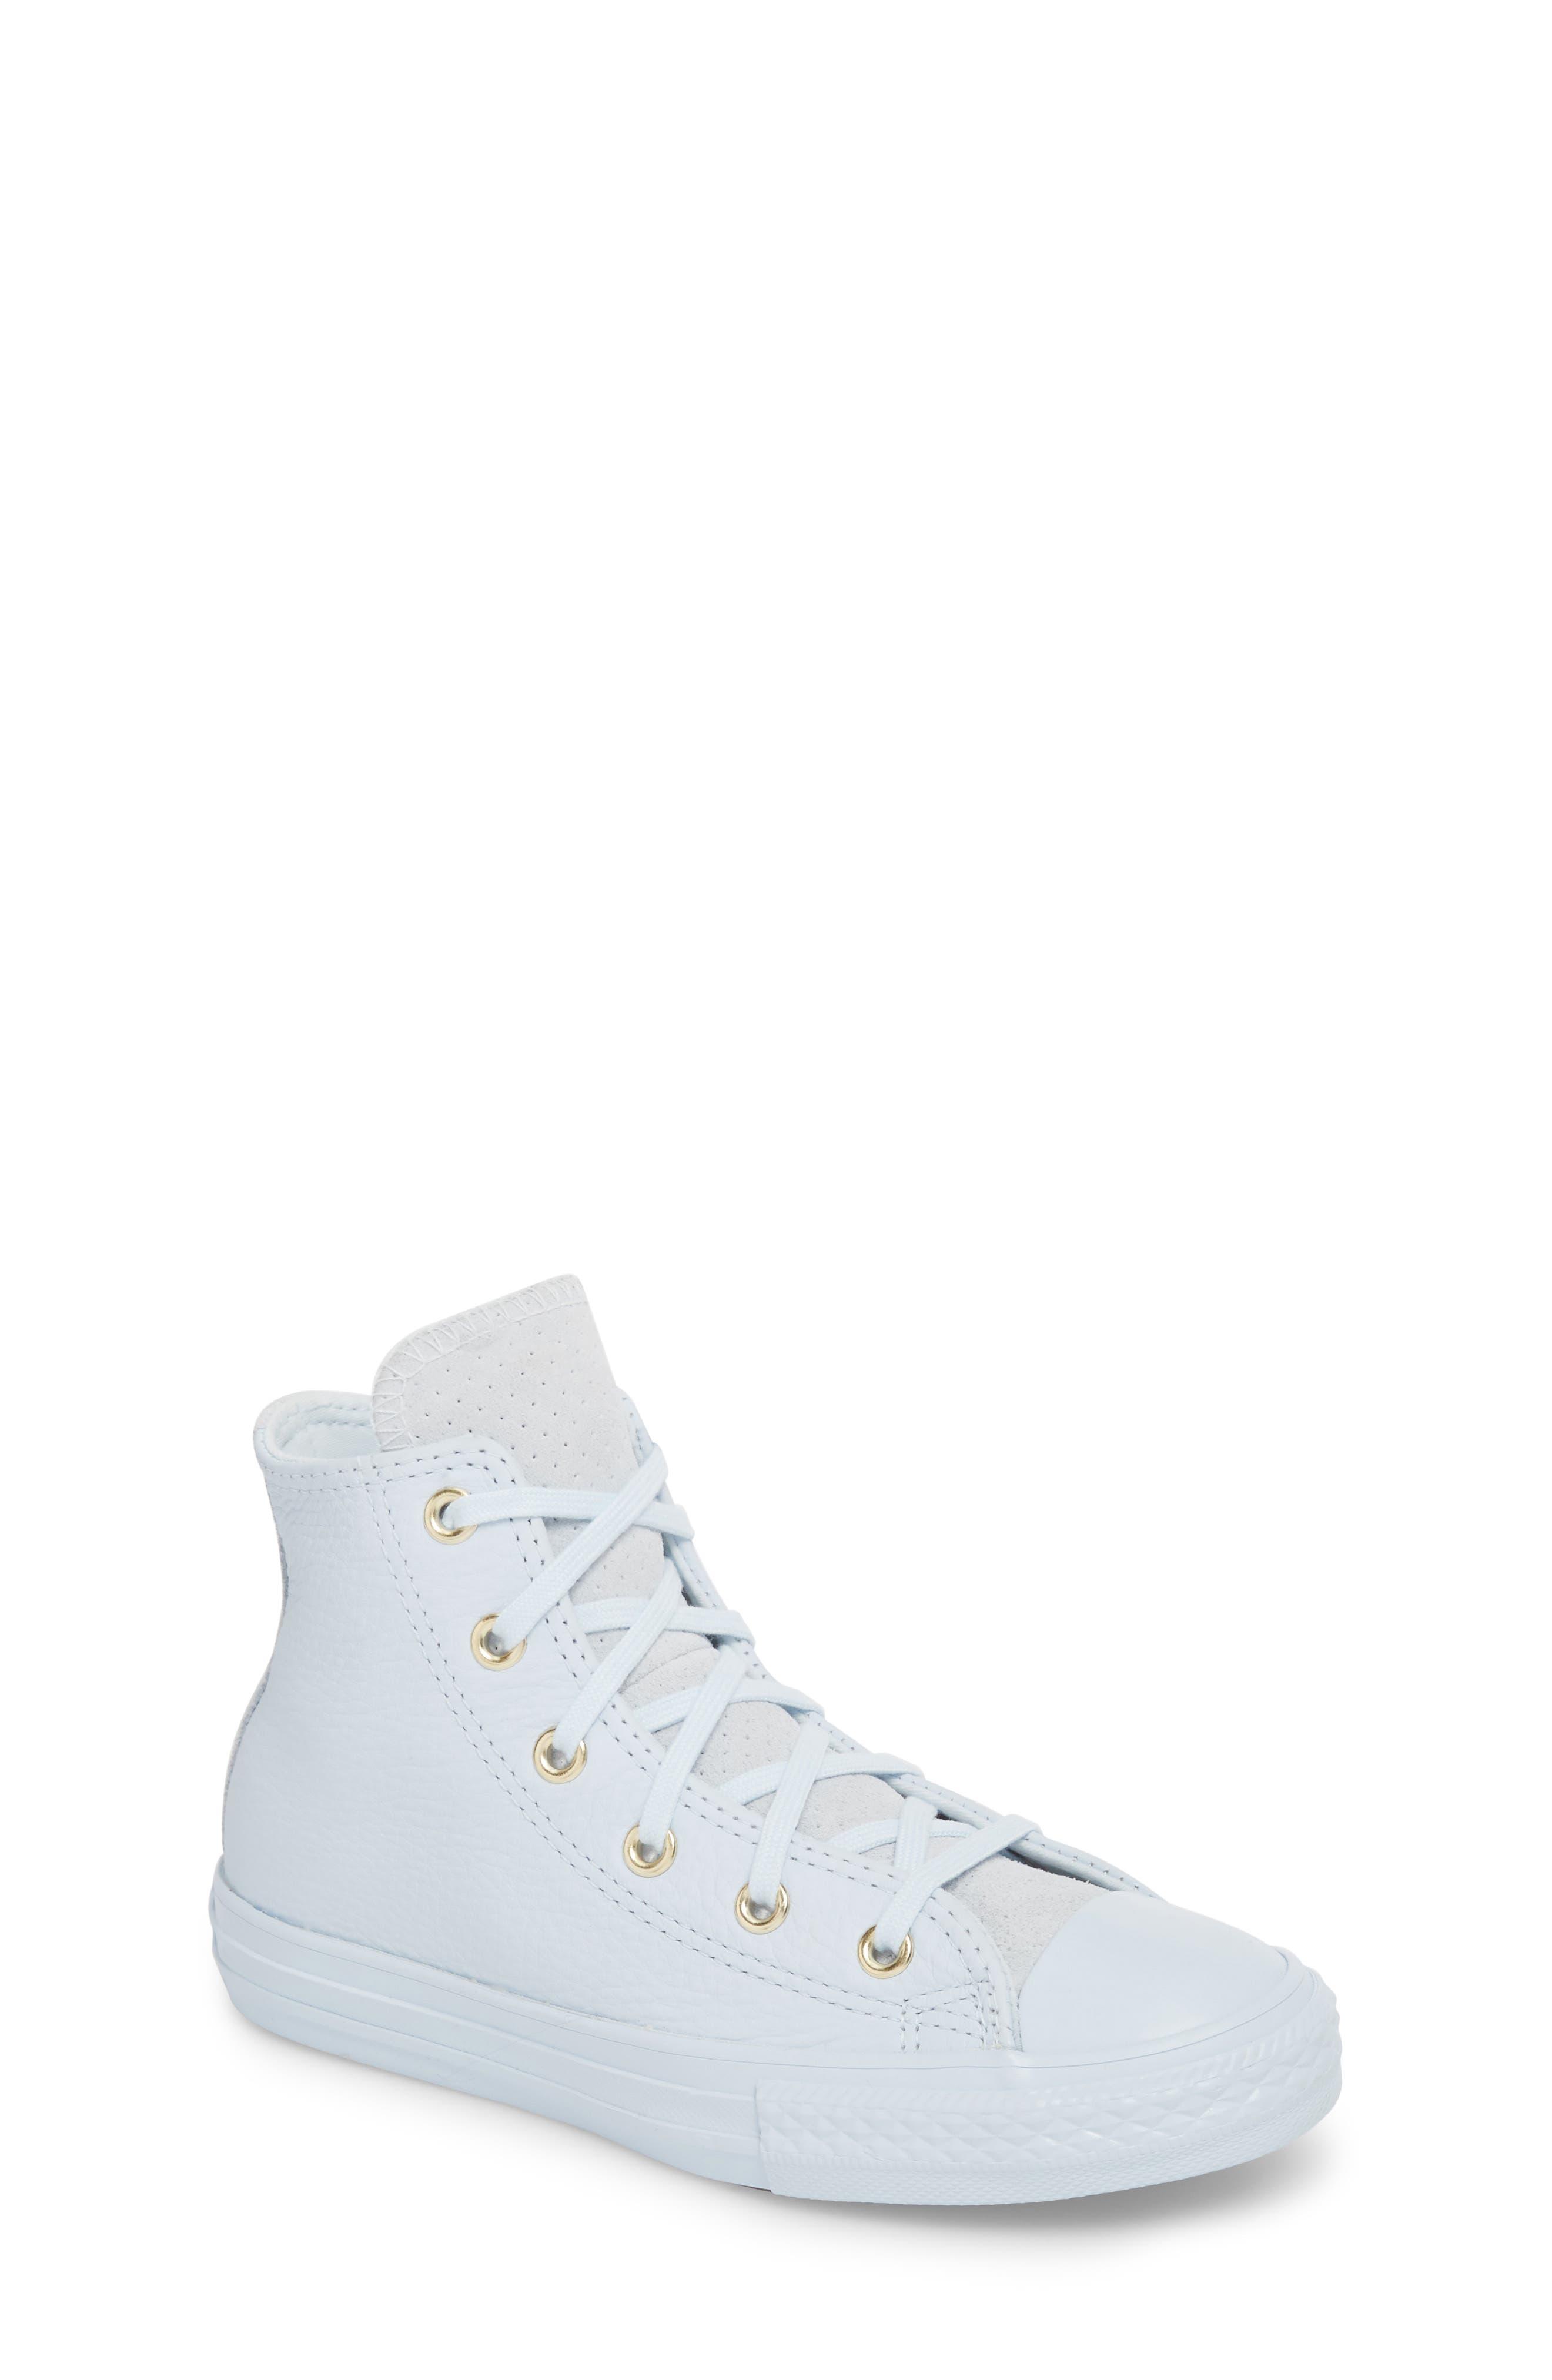 Chuck Taylor<sup>®</sup> All Star<sup>®</sup> Mono High Top Sneaker,                             Main thumbnail 1, color,                             Blue Tint